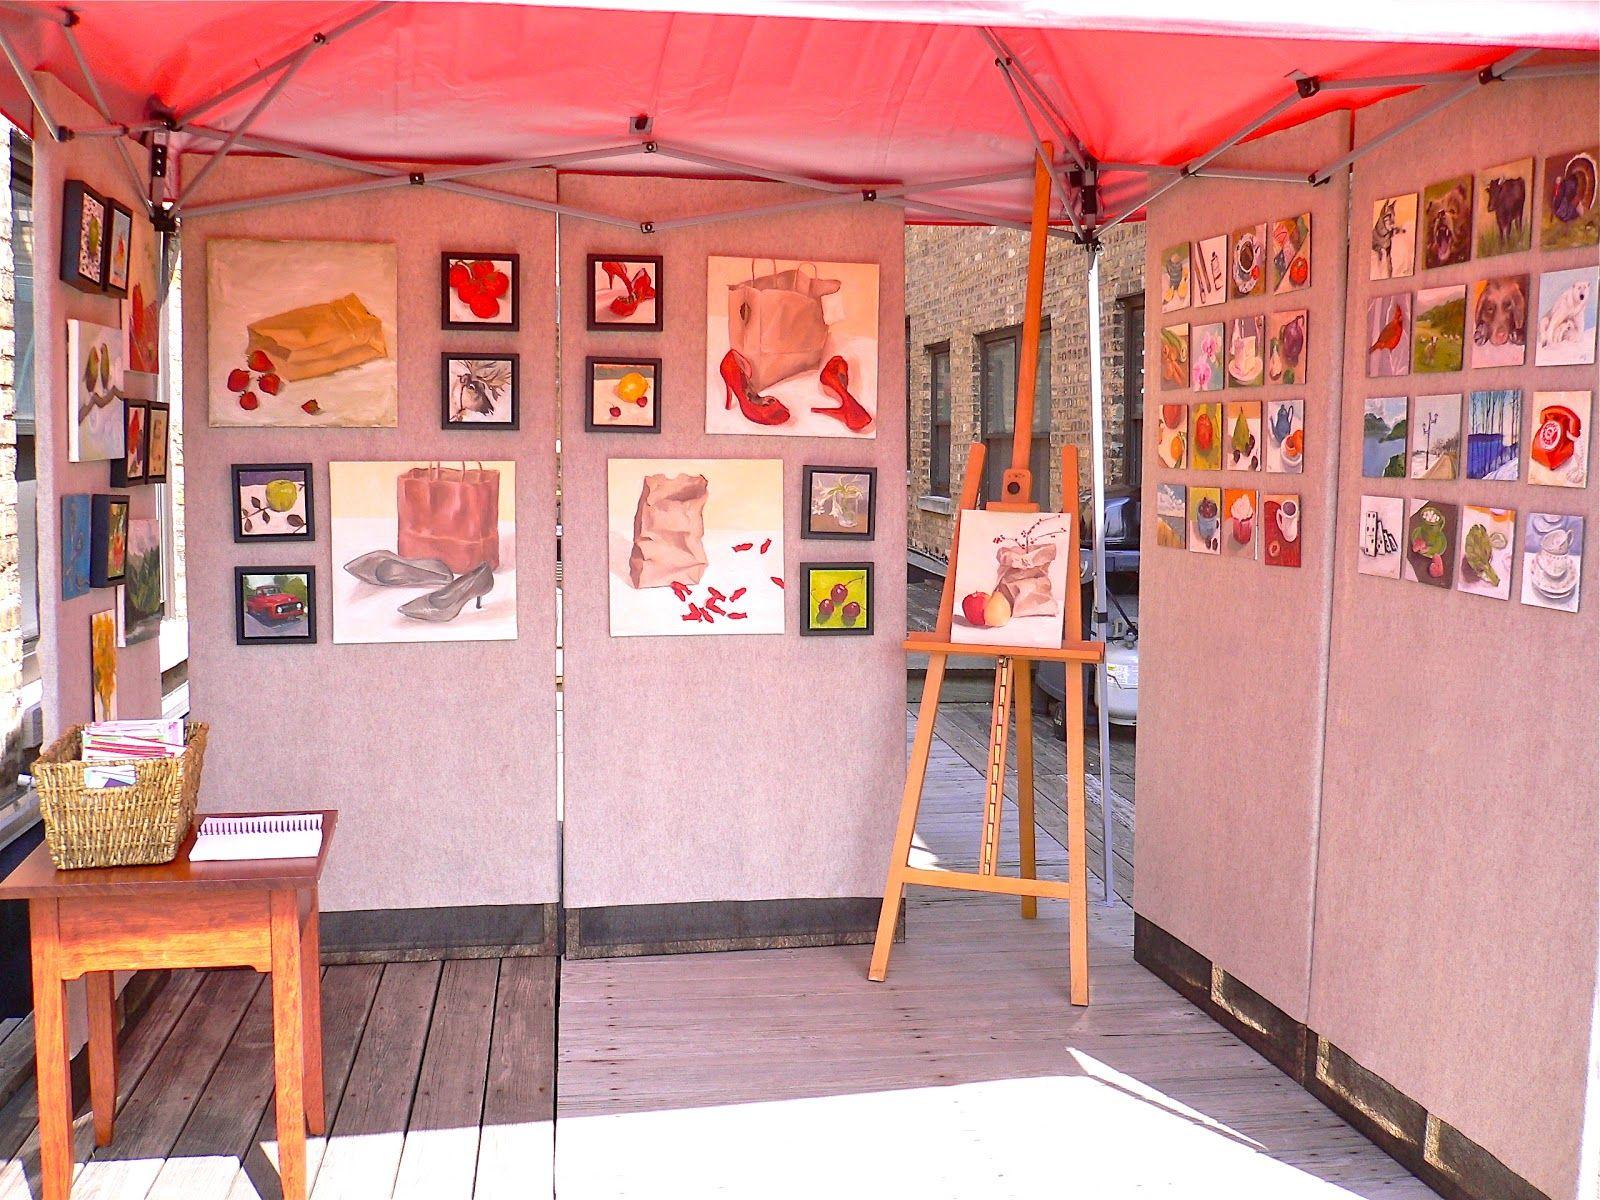 Diy Art Panels For Outdoor Display Art Display Panels Diy Art Panel Art